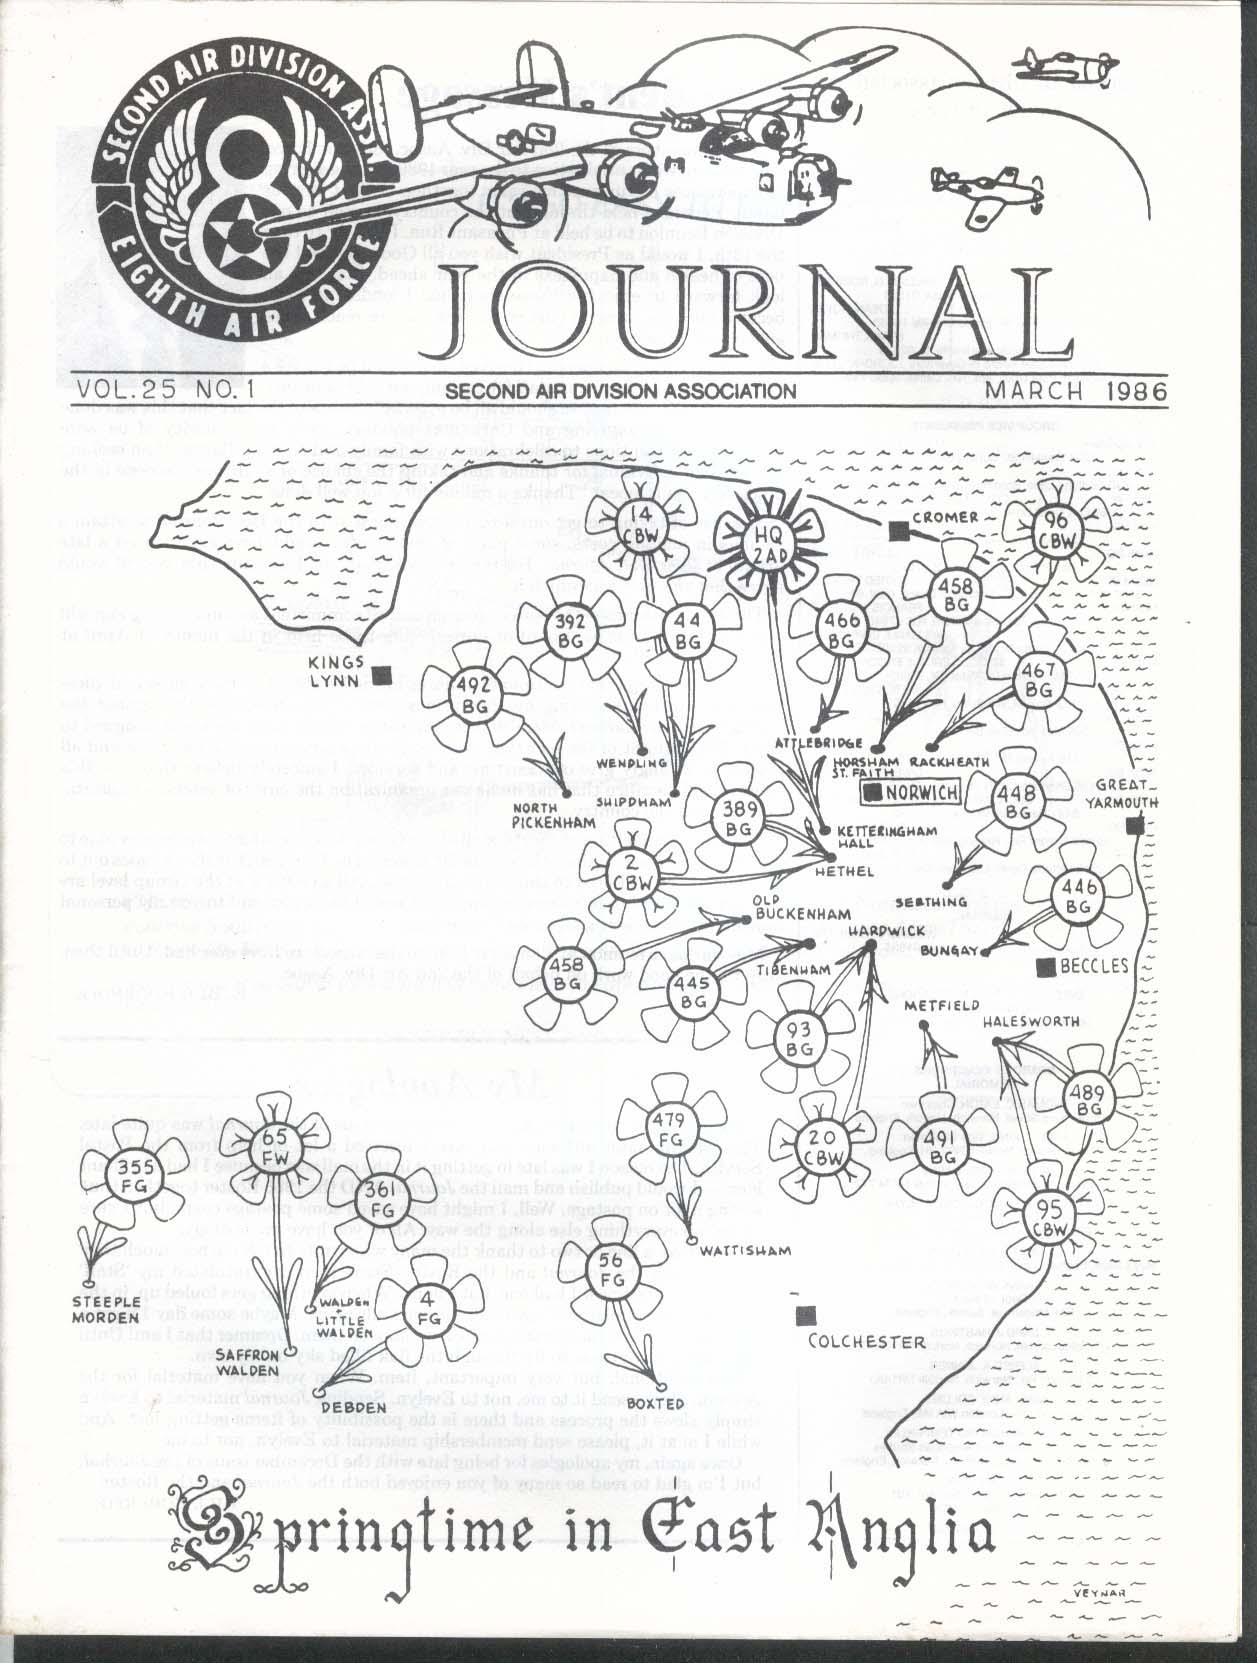 2nd Air Division Journal 8th Air Force Vol 25 #1 East Anglia 3 1986